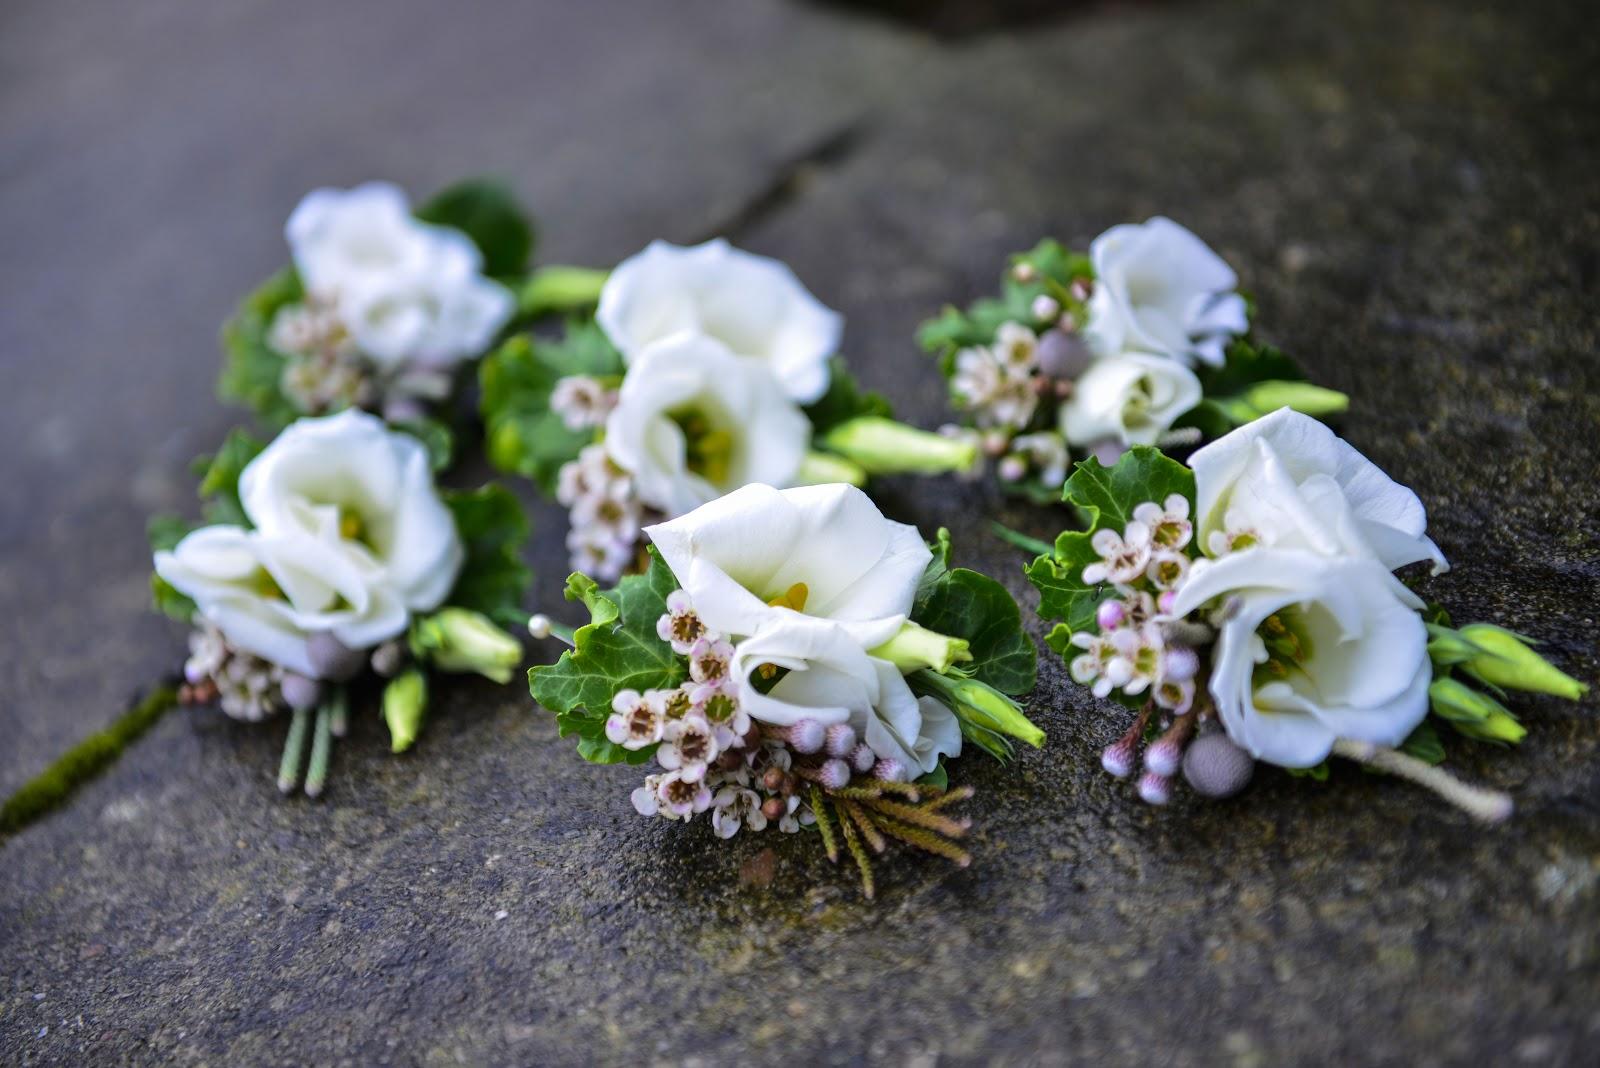 anastasia flowers, Natural flower